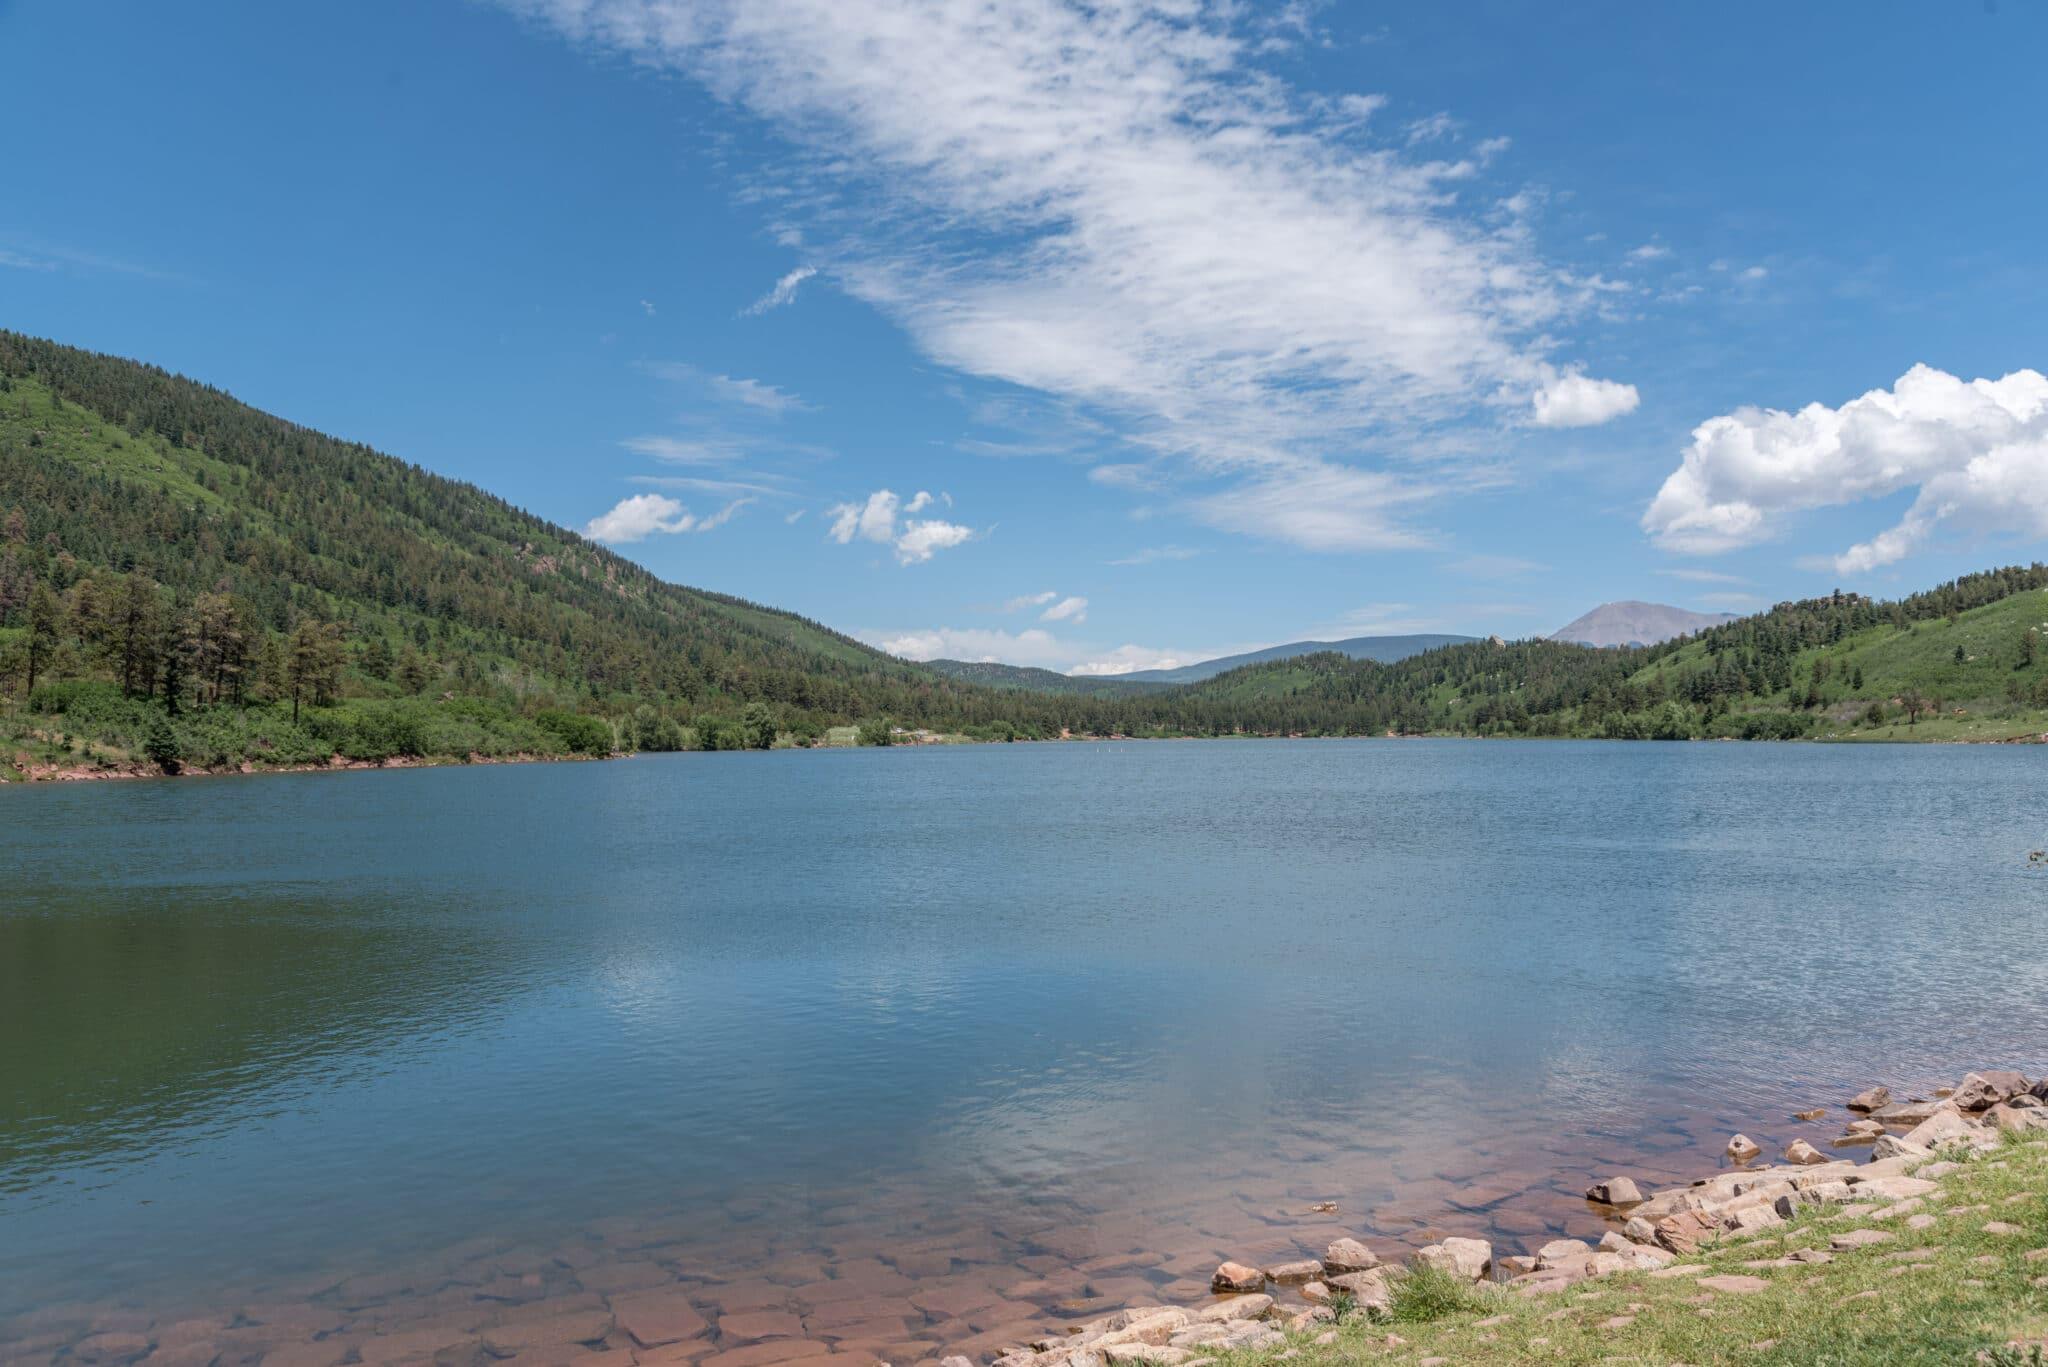 image of monument lake resort